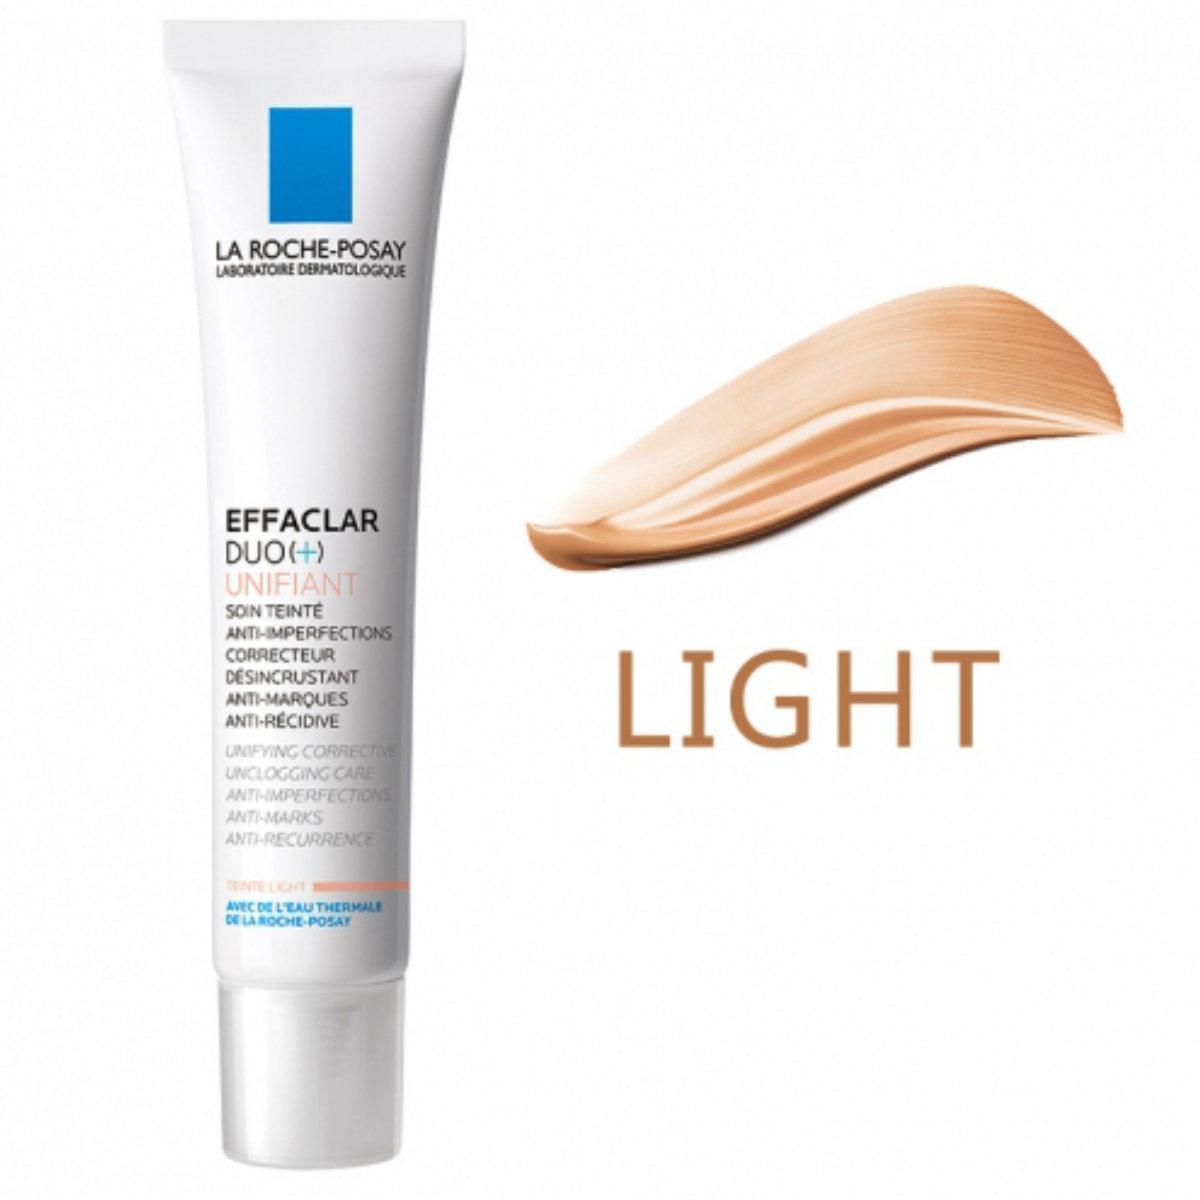 Effaclar Duo (+) Unifiant Light Shade 40 ml